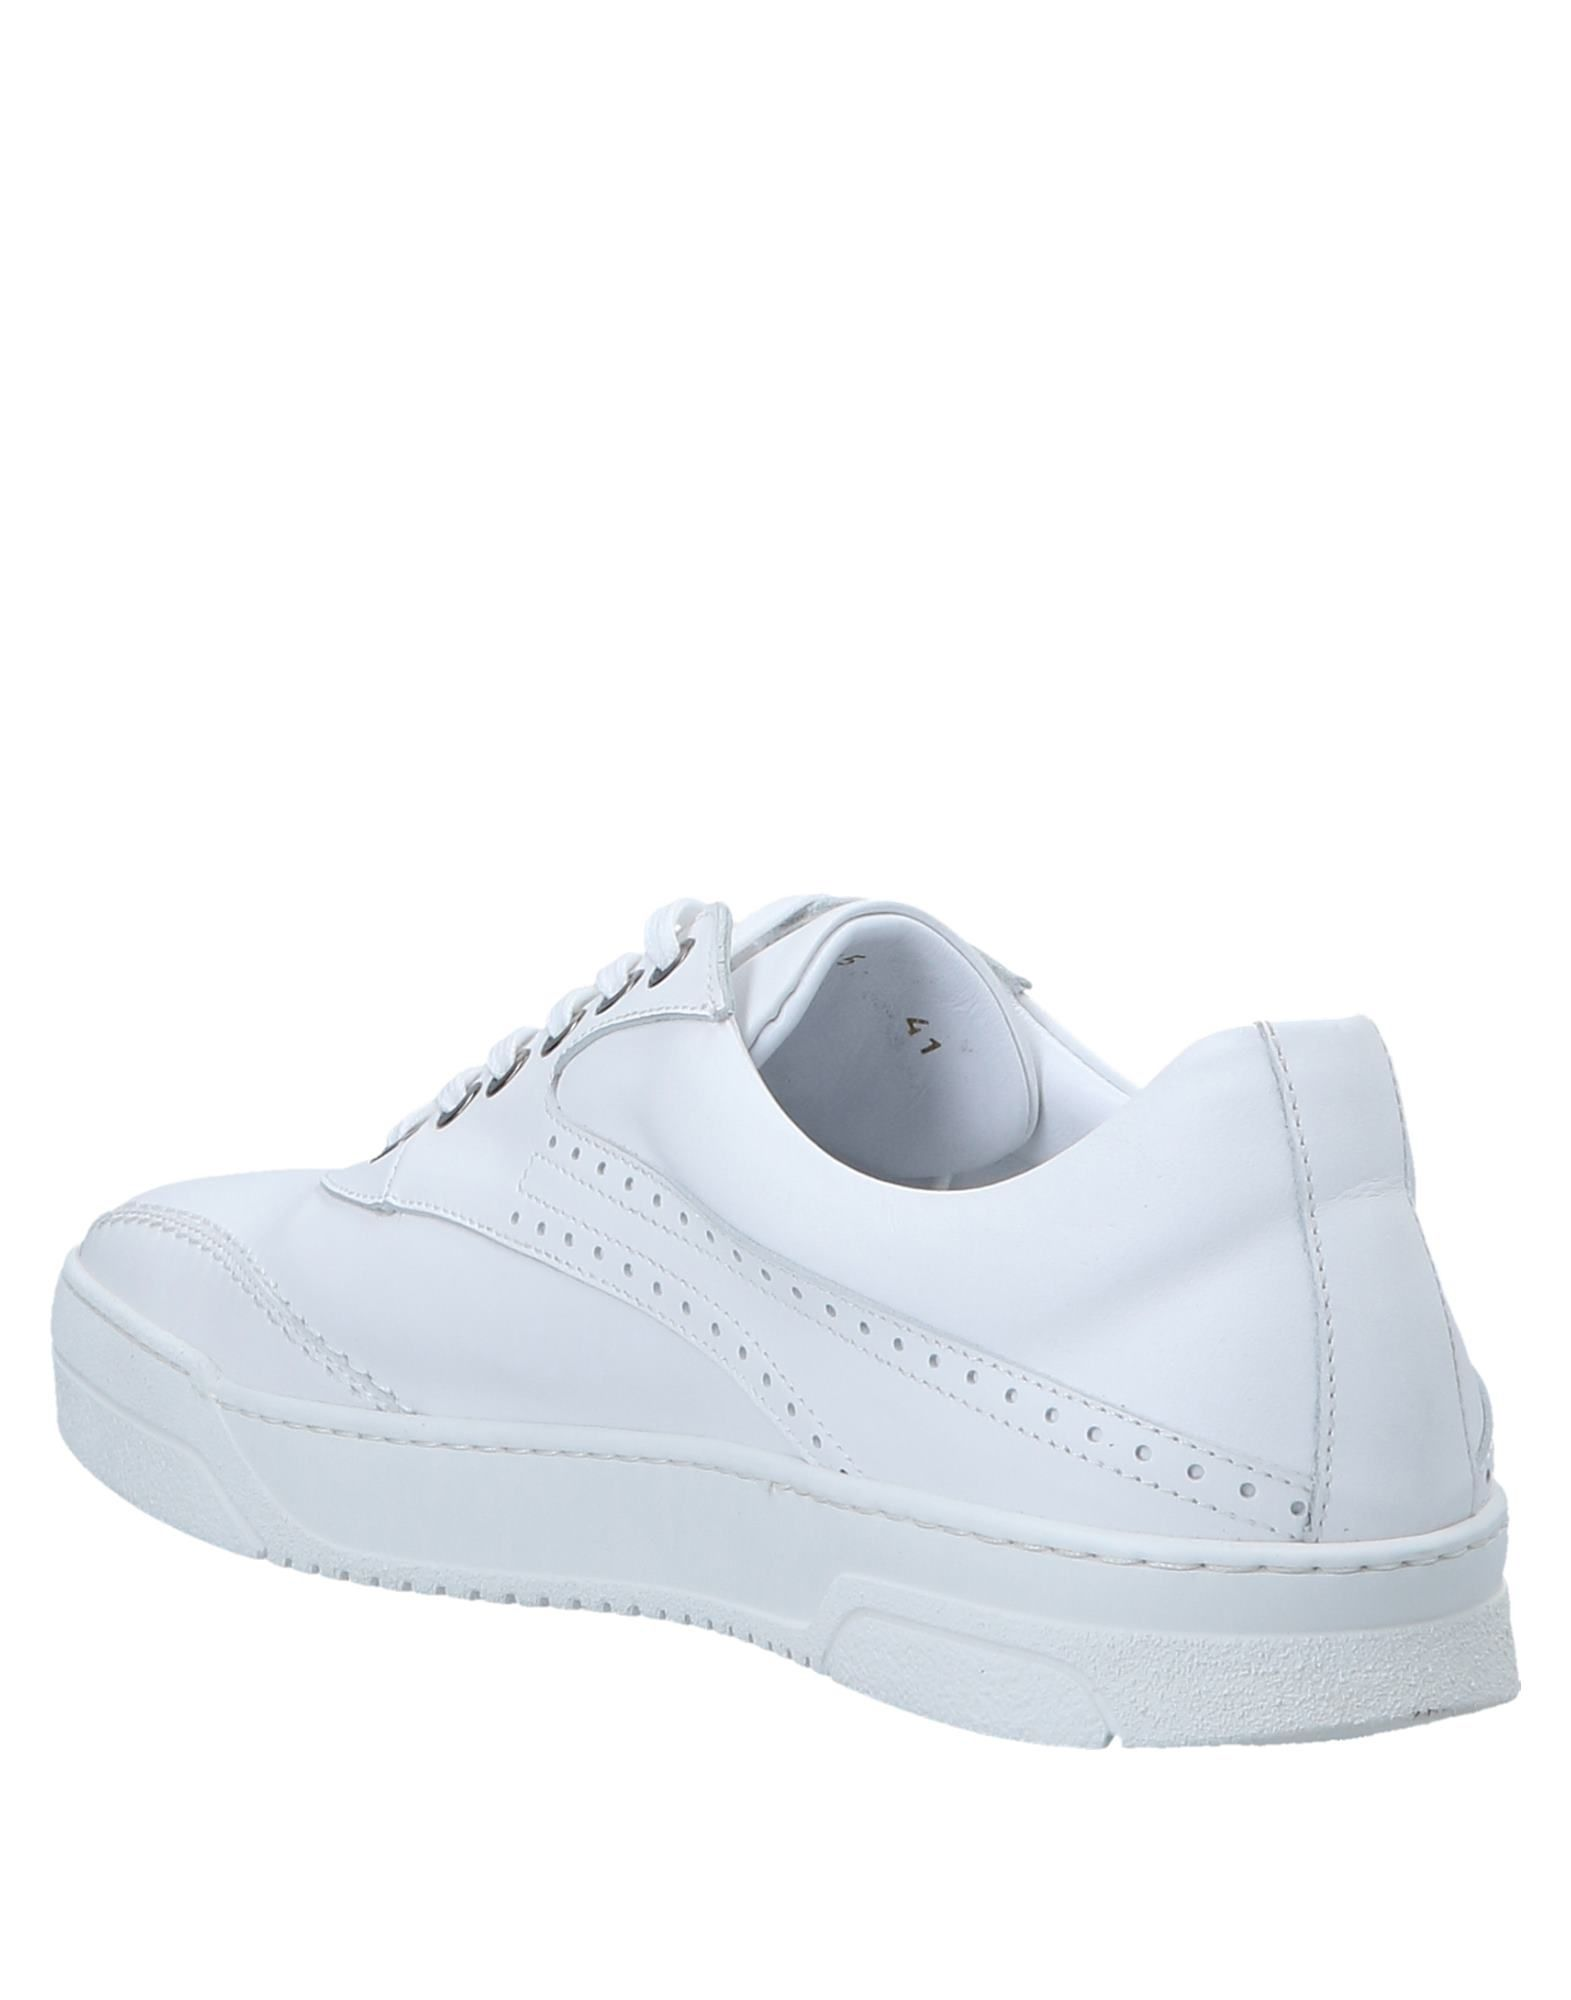 Gianfranco Lattanzi Gute Sneakers Herren  11547071PL Gute Lattanzi Qualität beliebte Schuhe e9b0b1